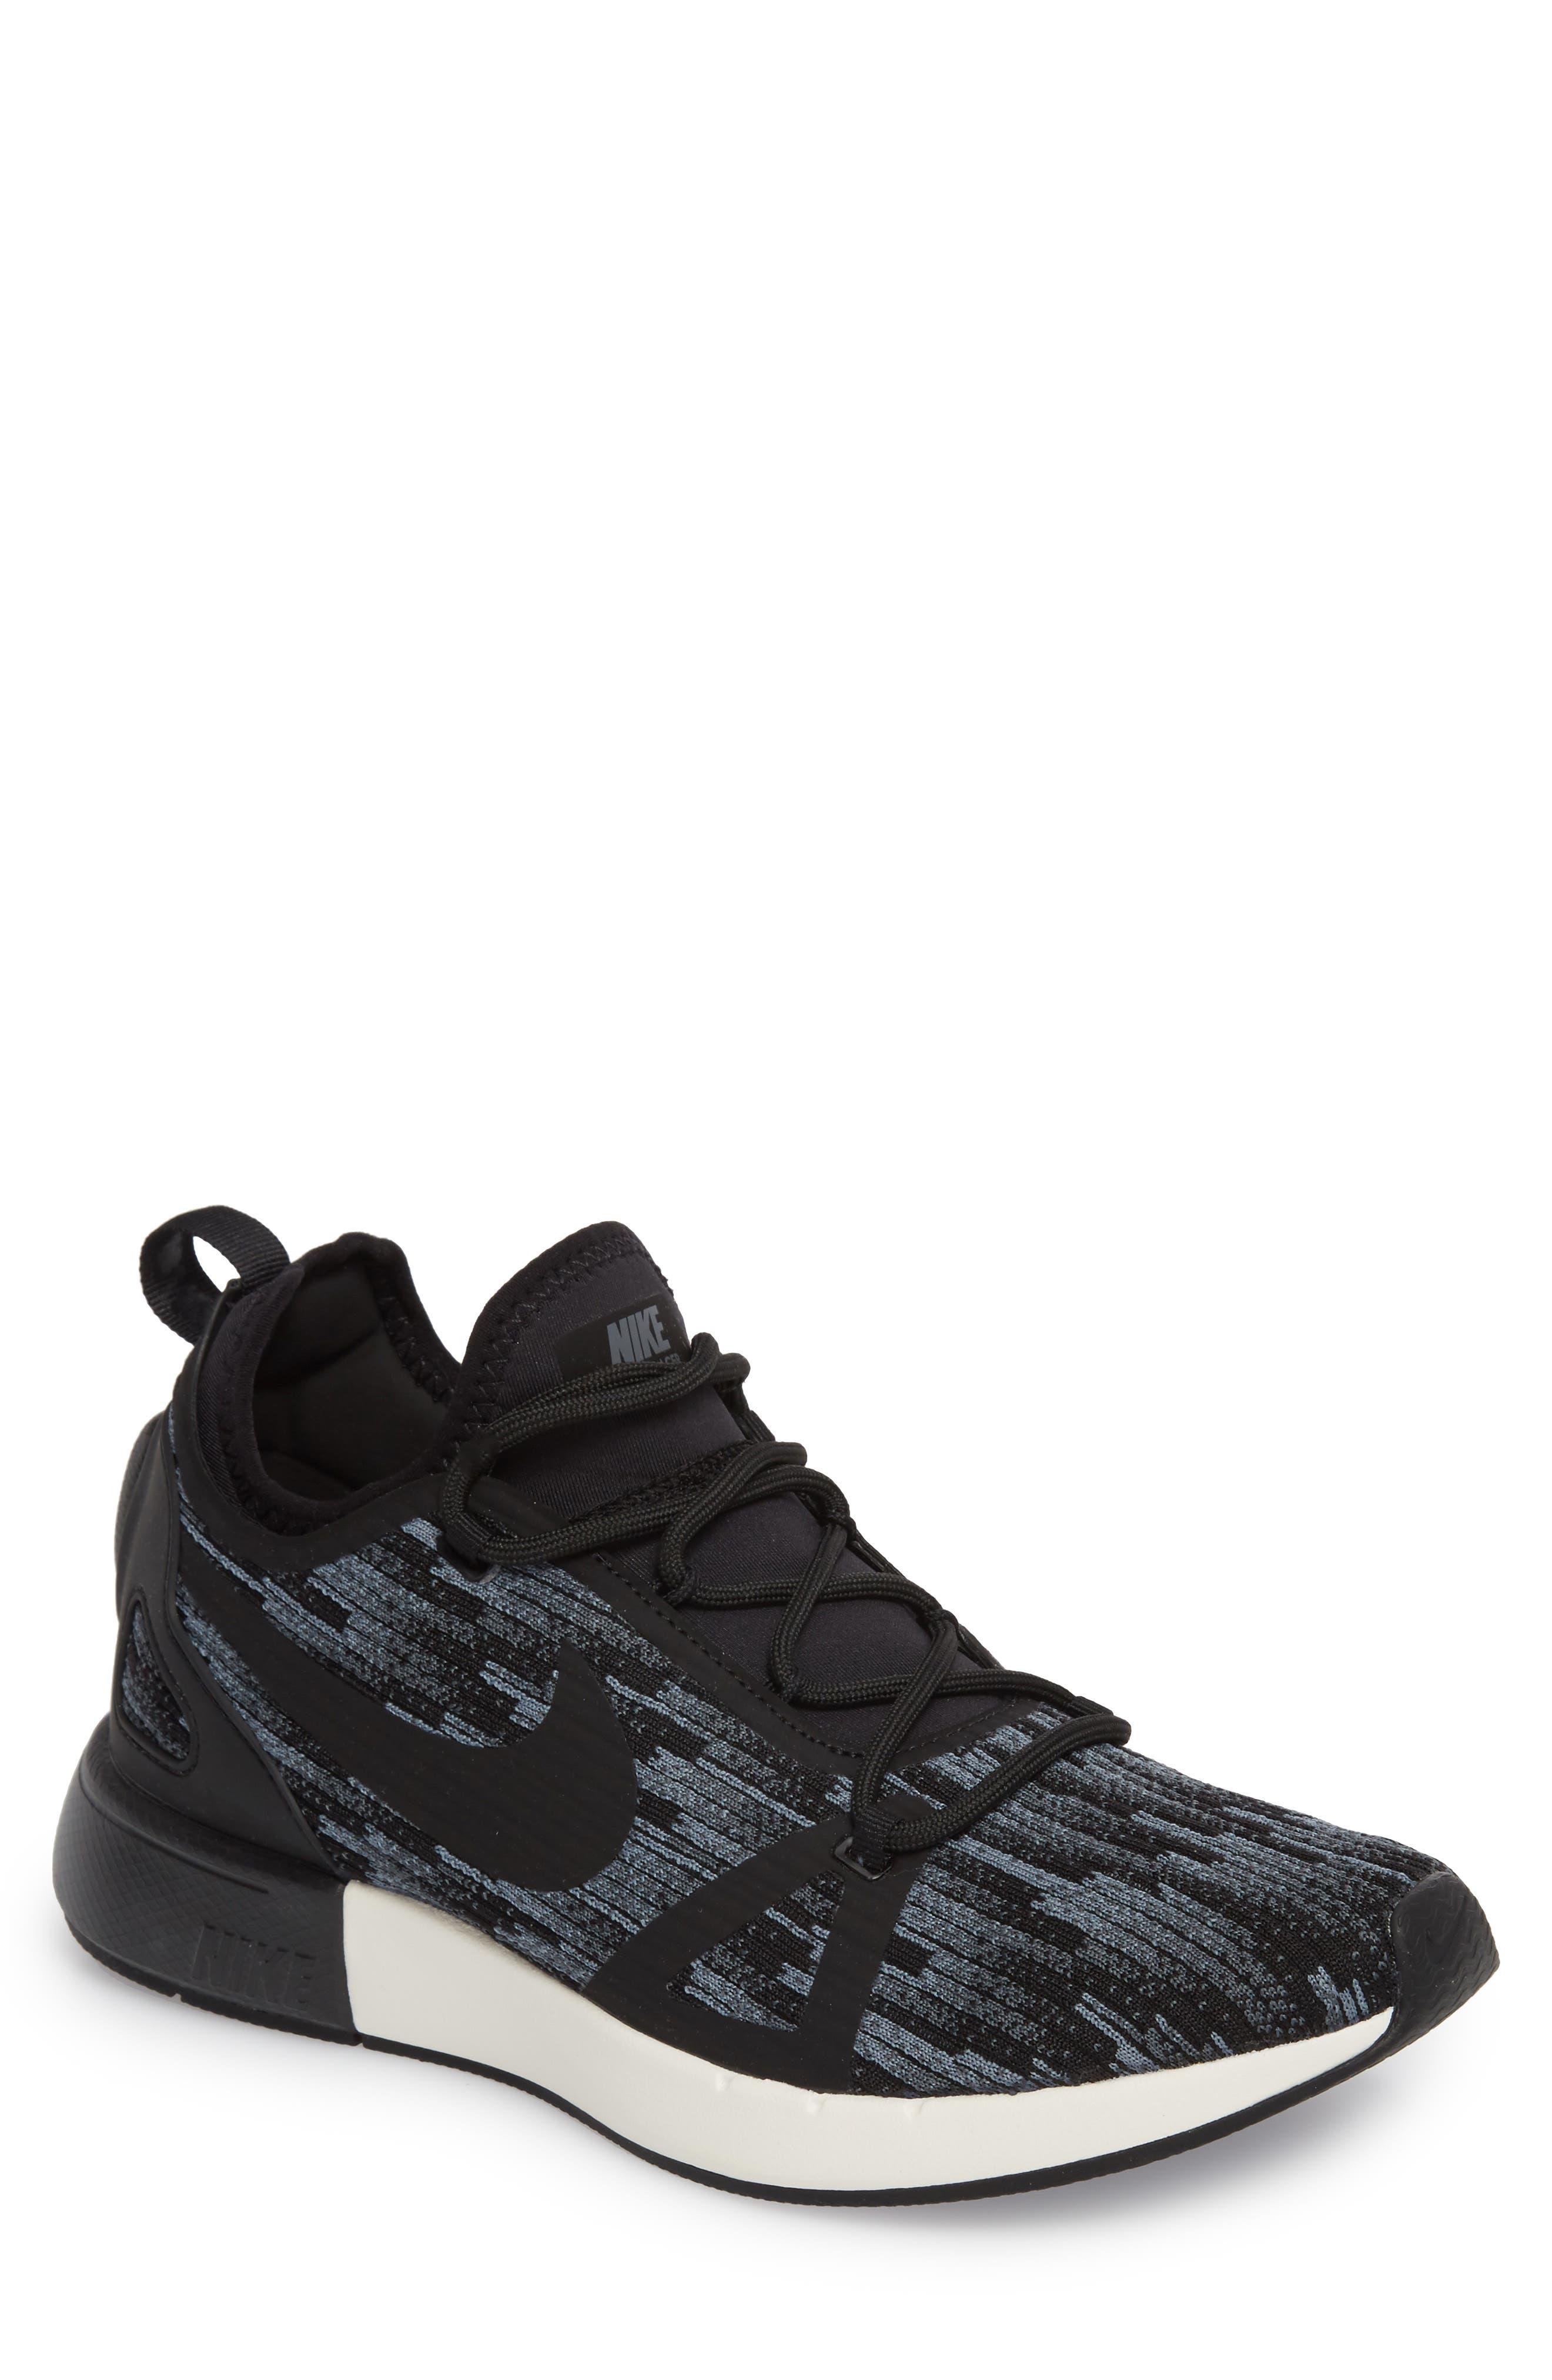 Alternate Image 1 Selected - Nike Duel Racer SE Knit Sneaker (Women)